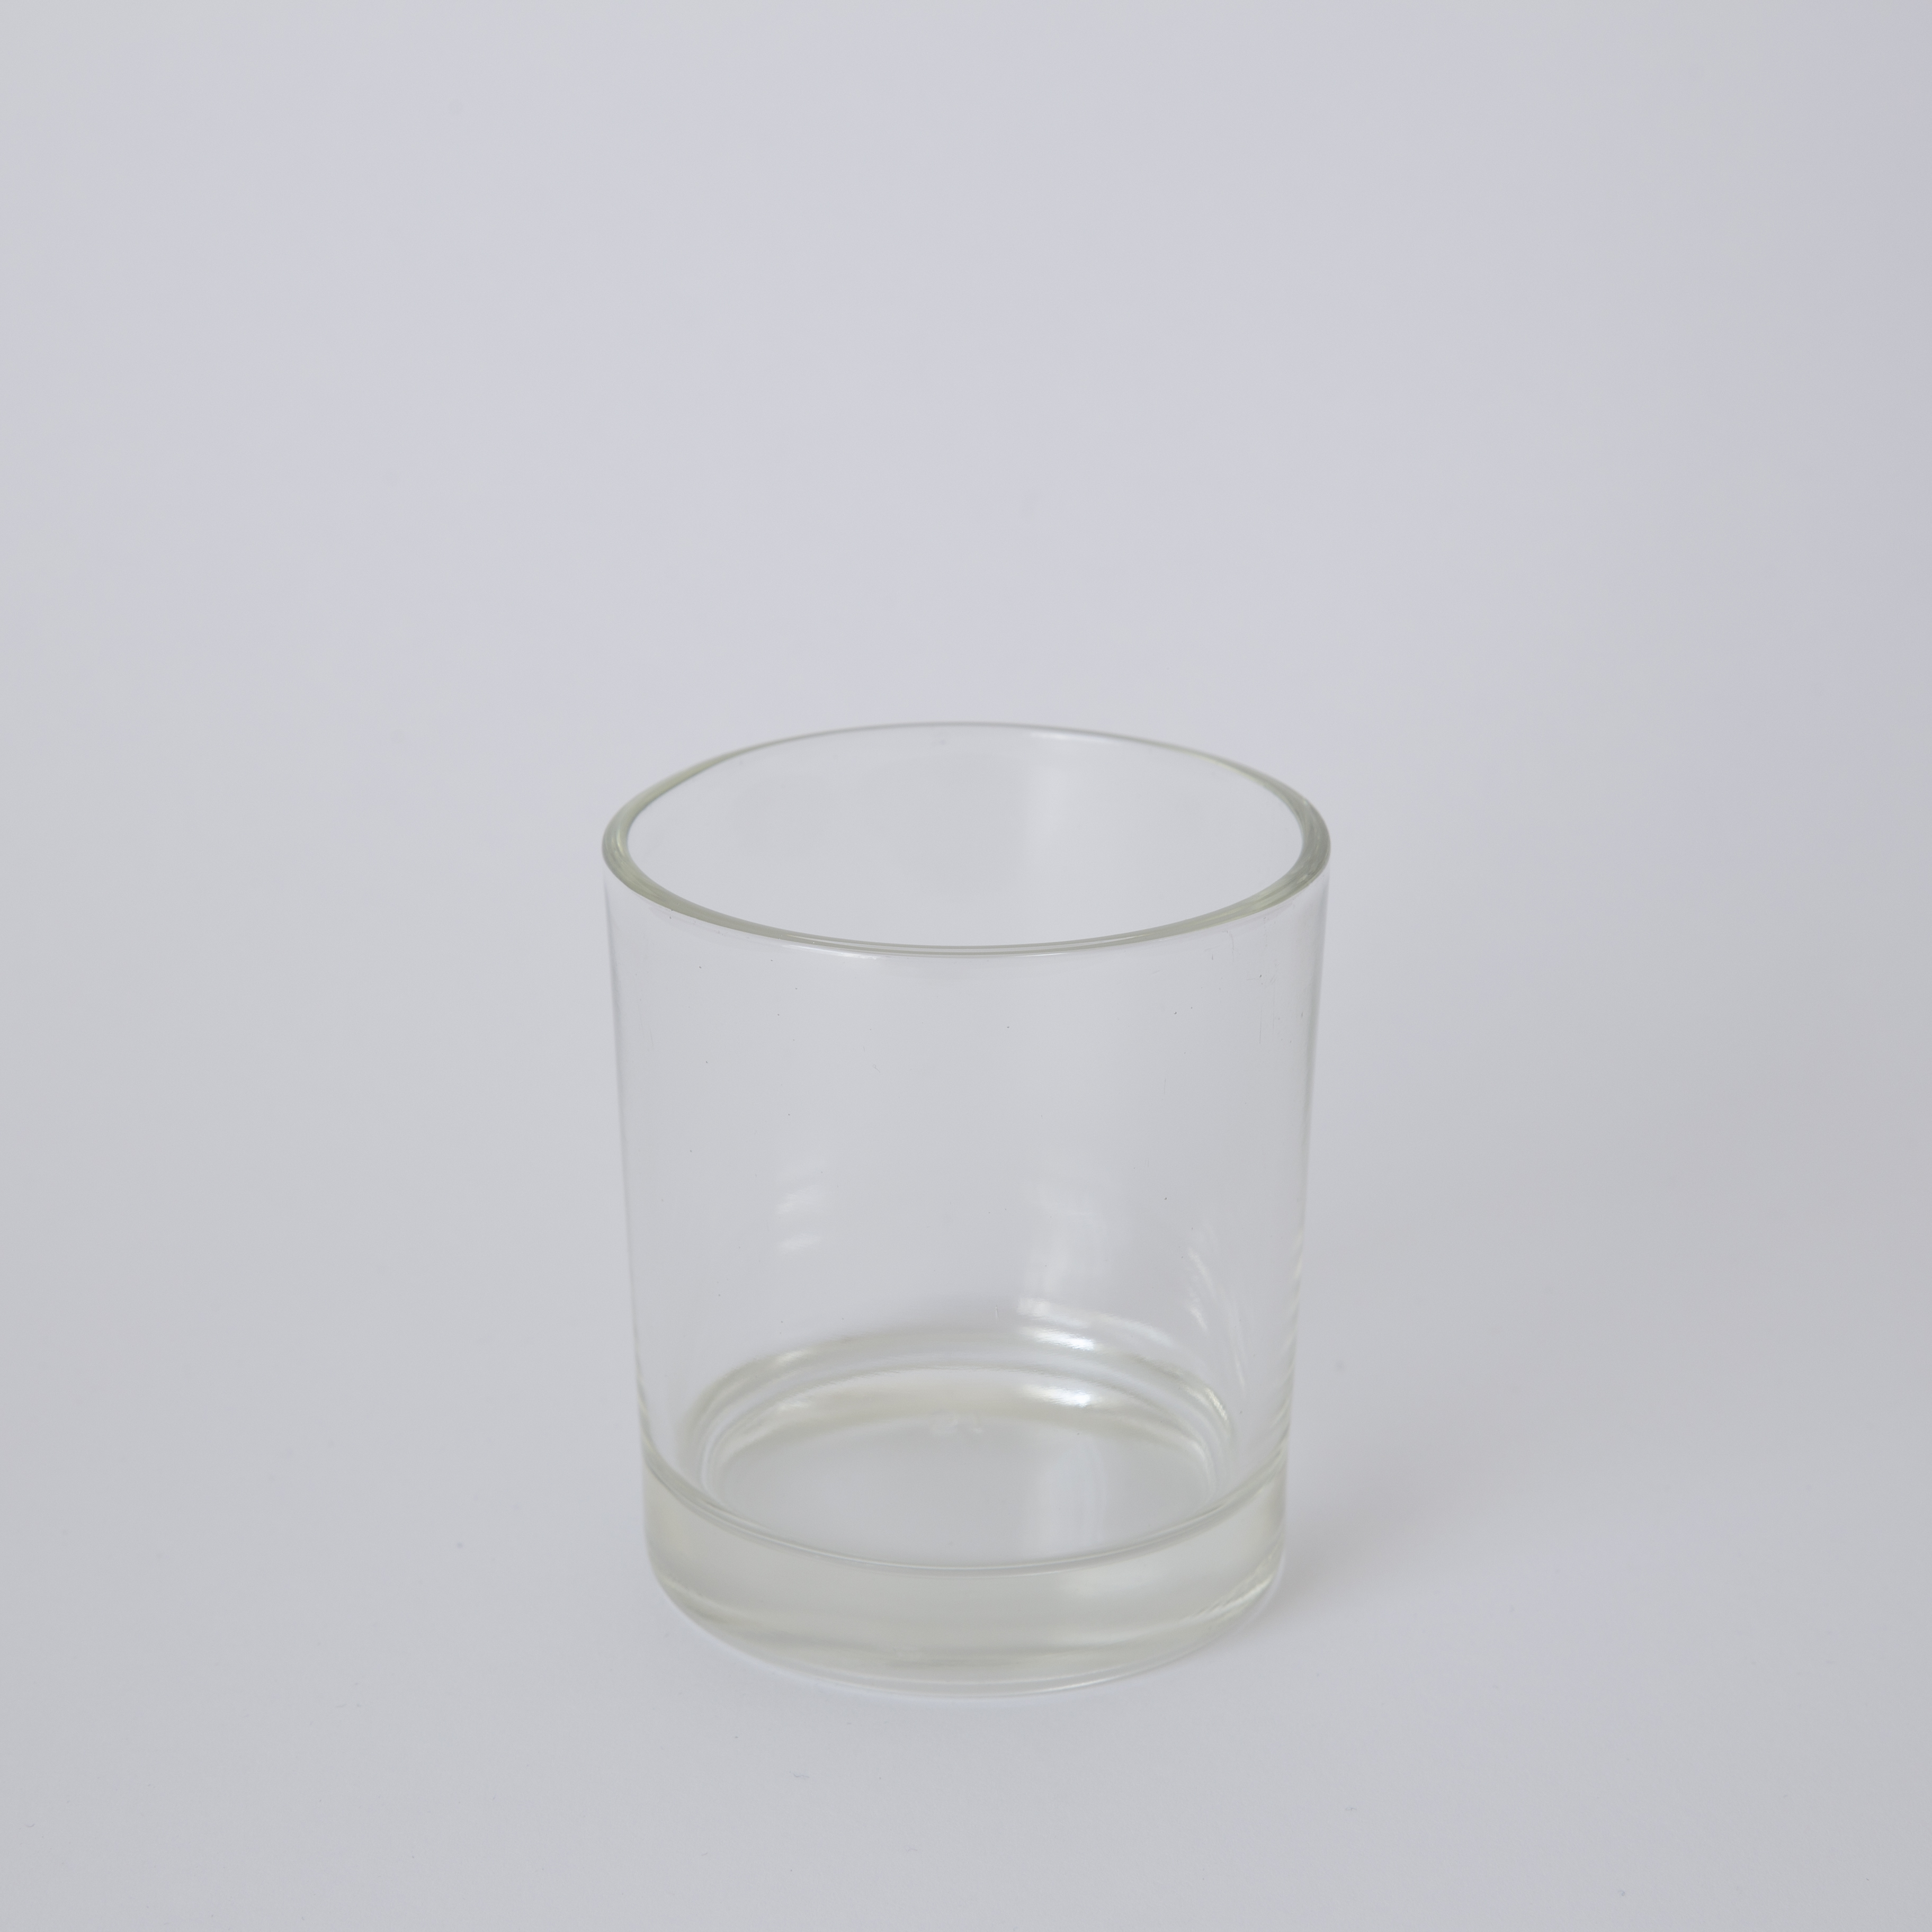 Trinkglas IV (2015)